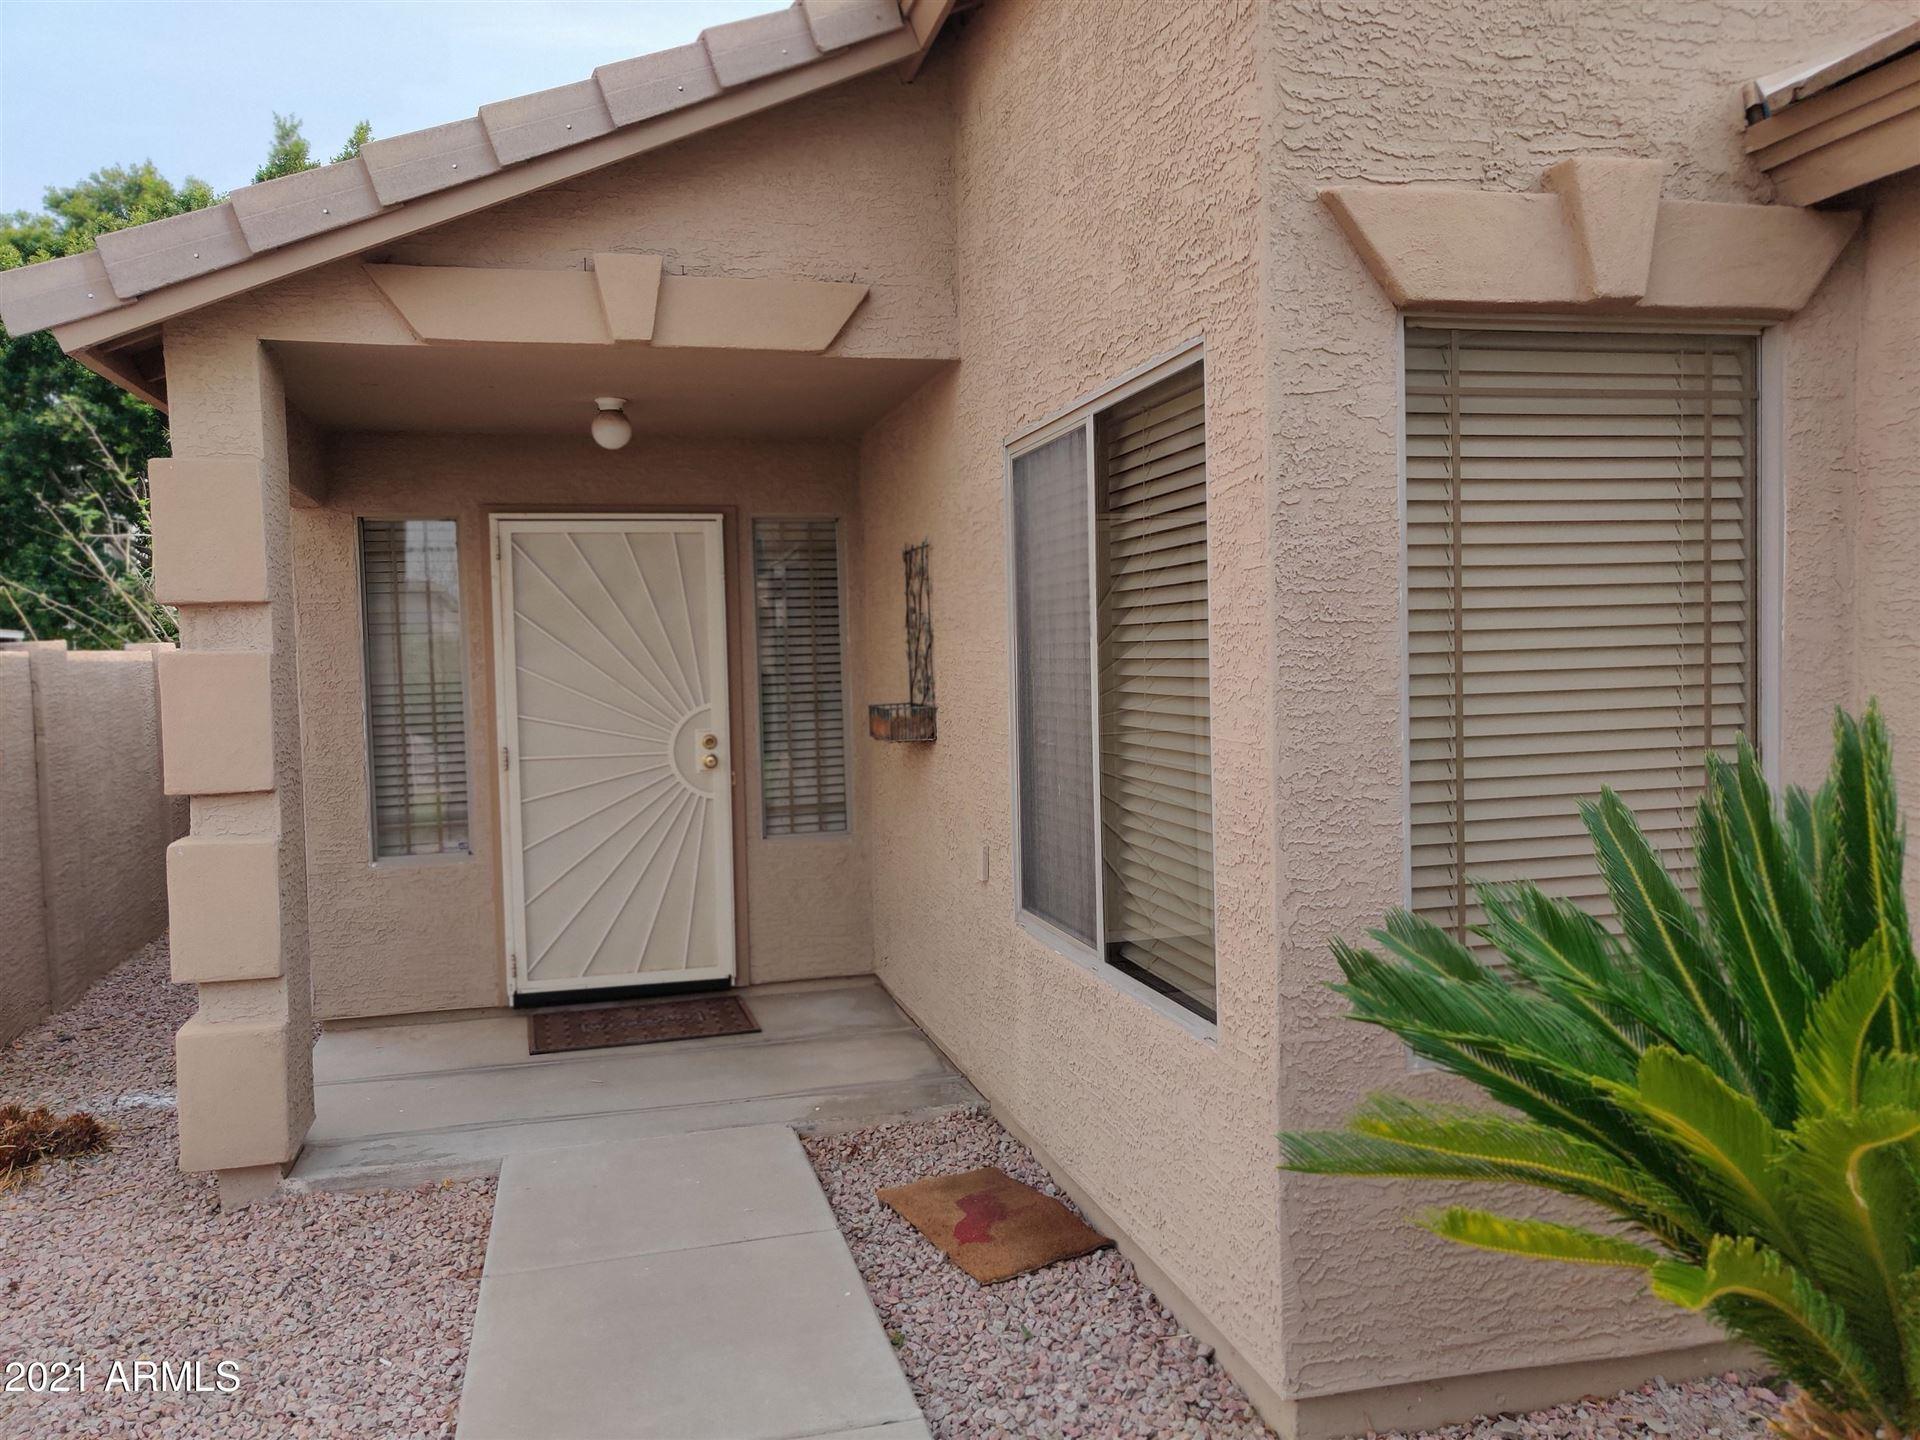 Photo of 475 W GARY Avenue, Gilbert, AZ 85233 (MLS # 6269258)